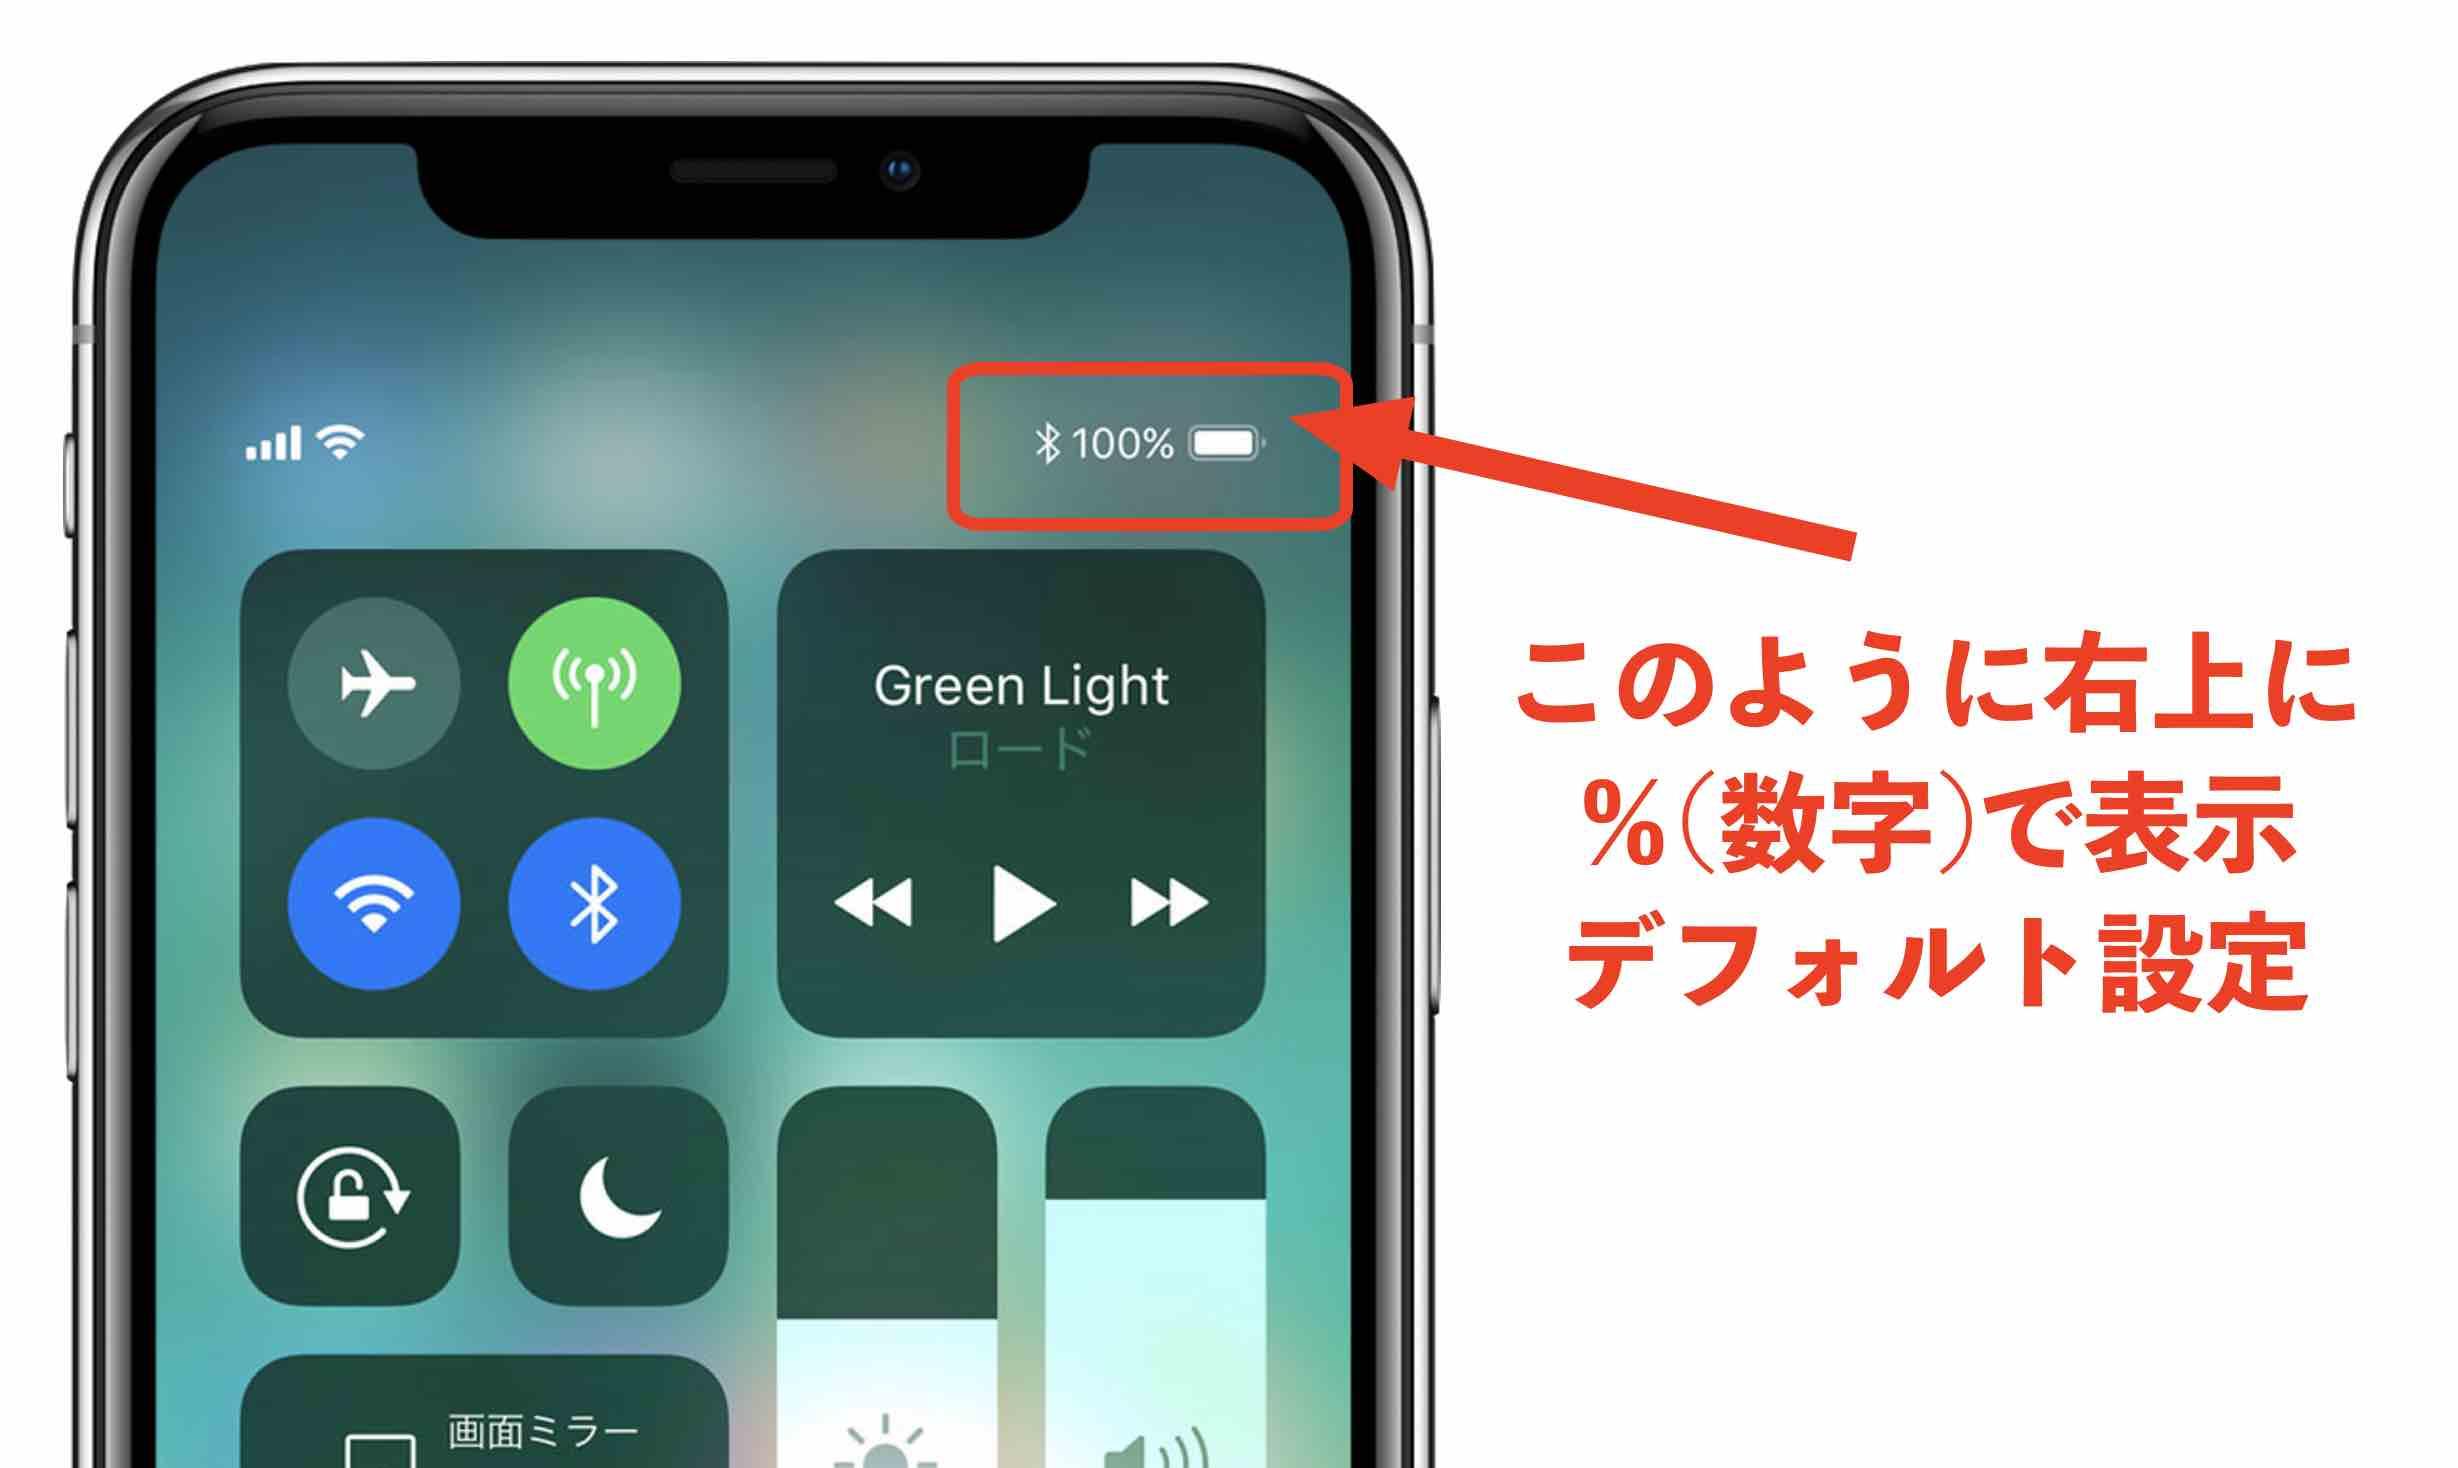 iPhonXバッテリー残量数字表示の写真